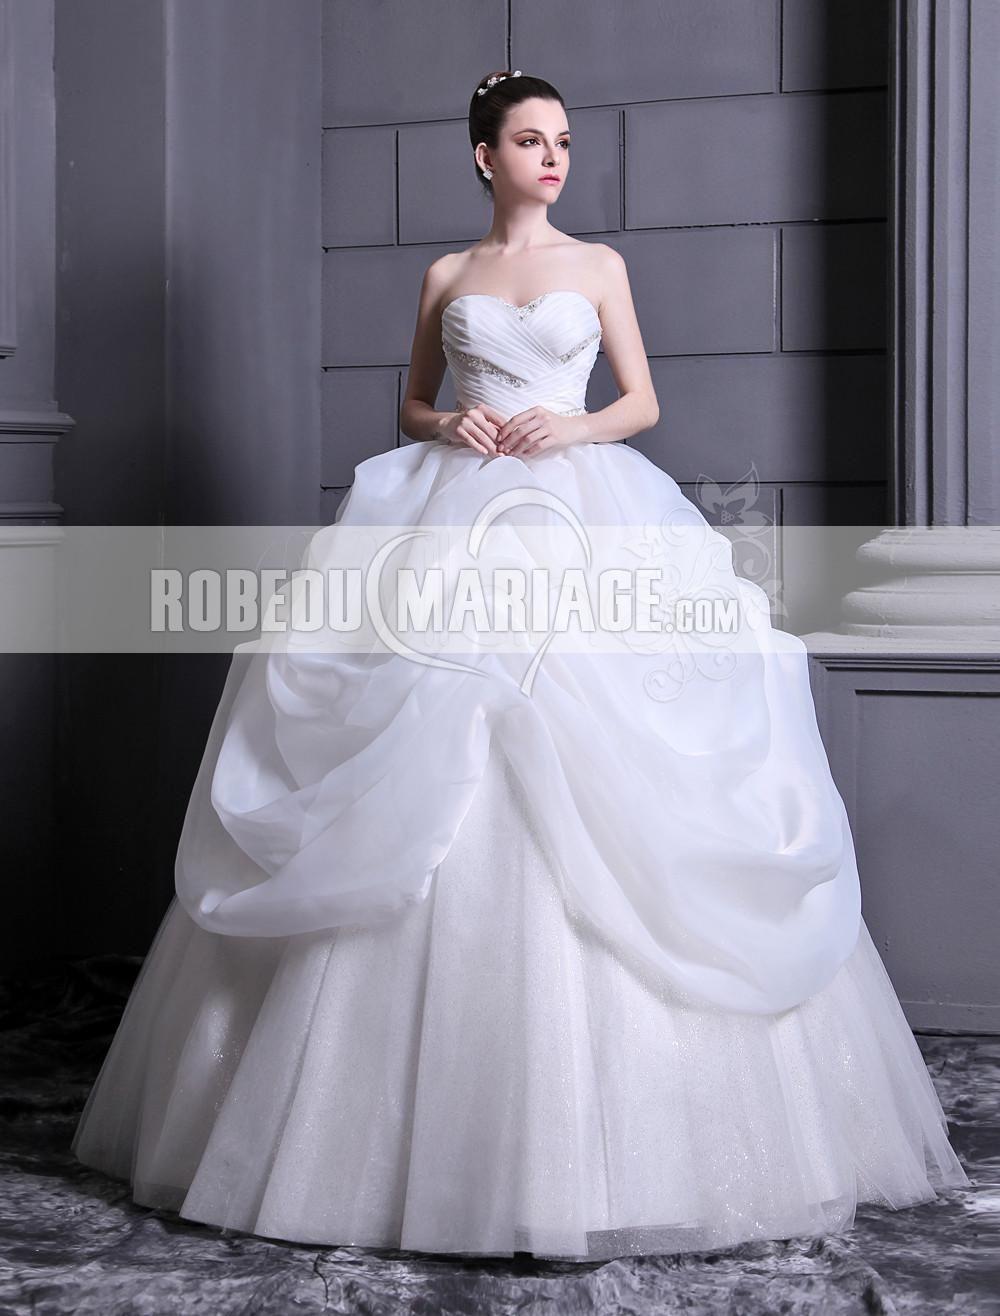 Robe de mariee princesse prix